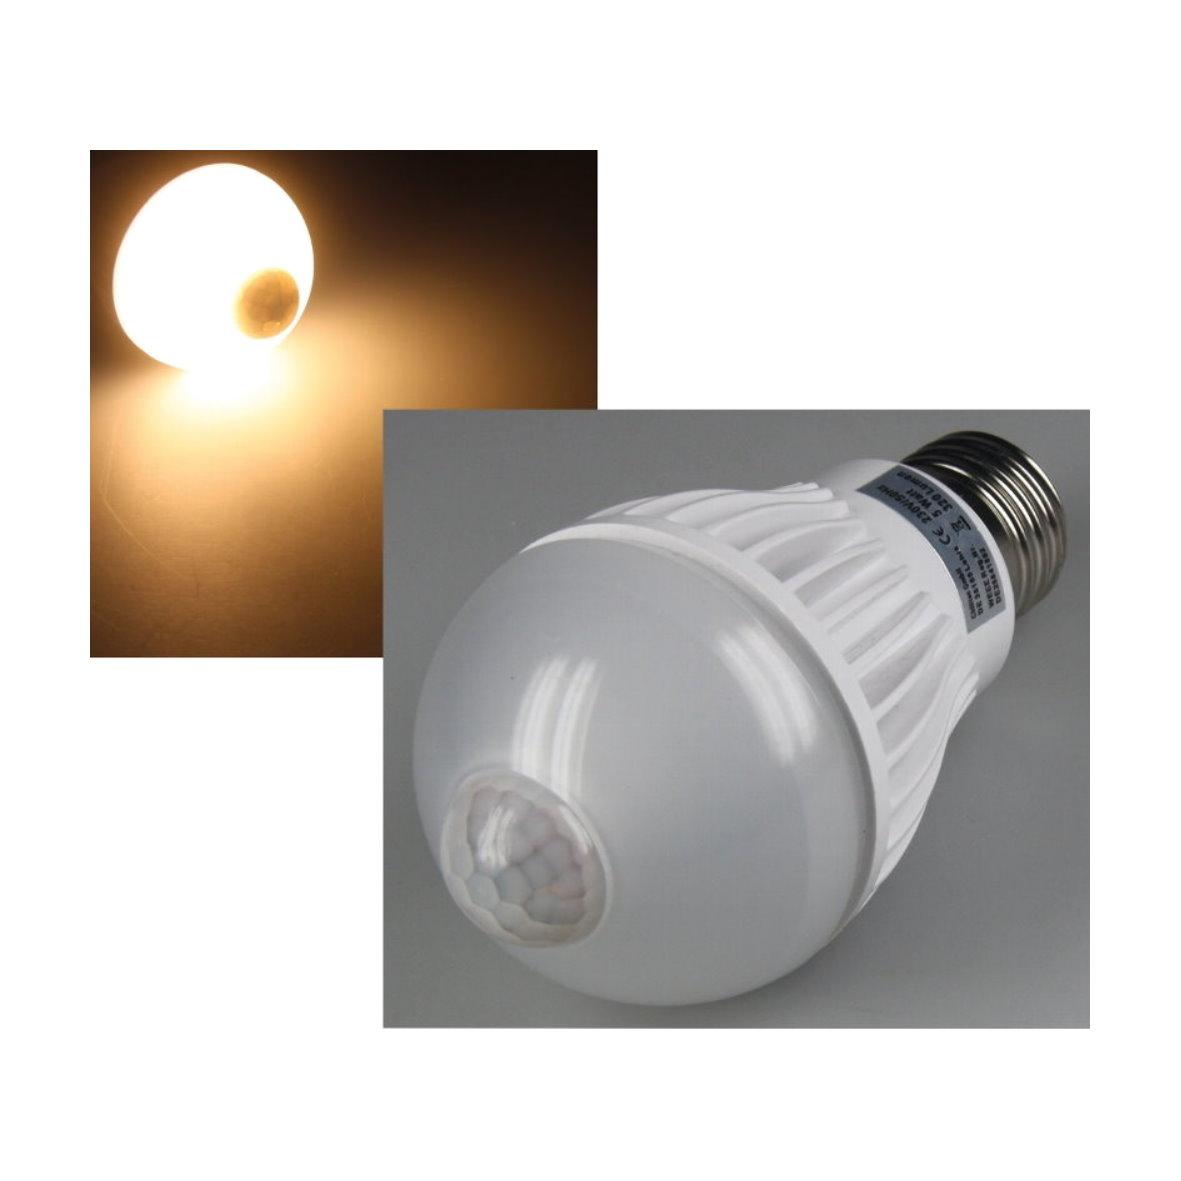 super power led smd birne e27 leuchtmittel lampe licht highlumen spot strahler ebay. Black Bedroom Furniture Sets. Home Design Ideas